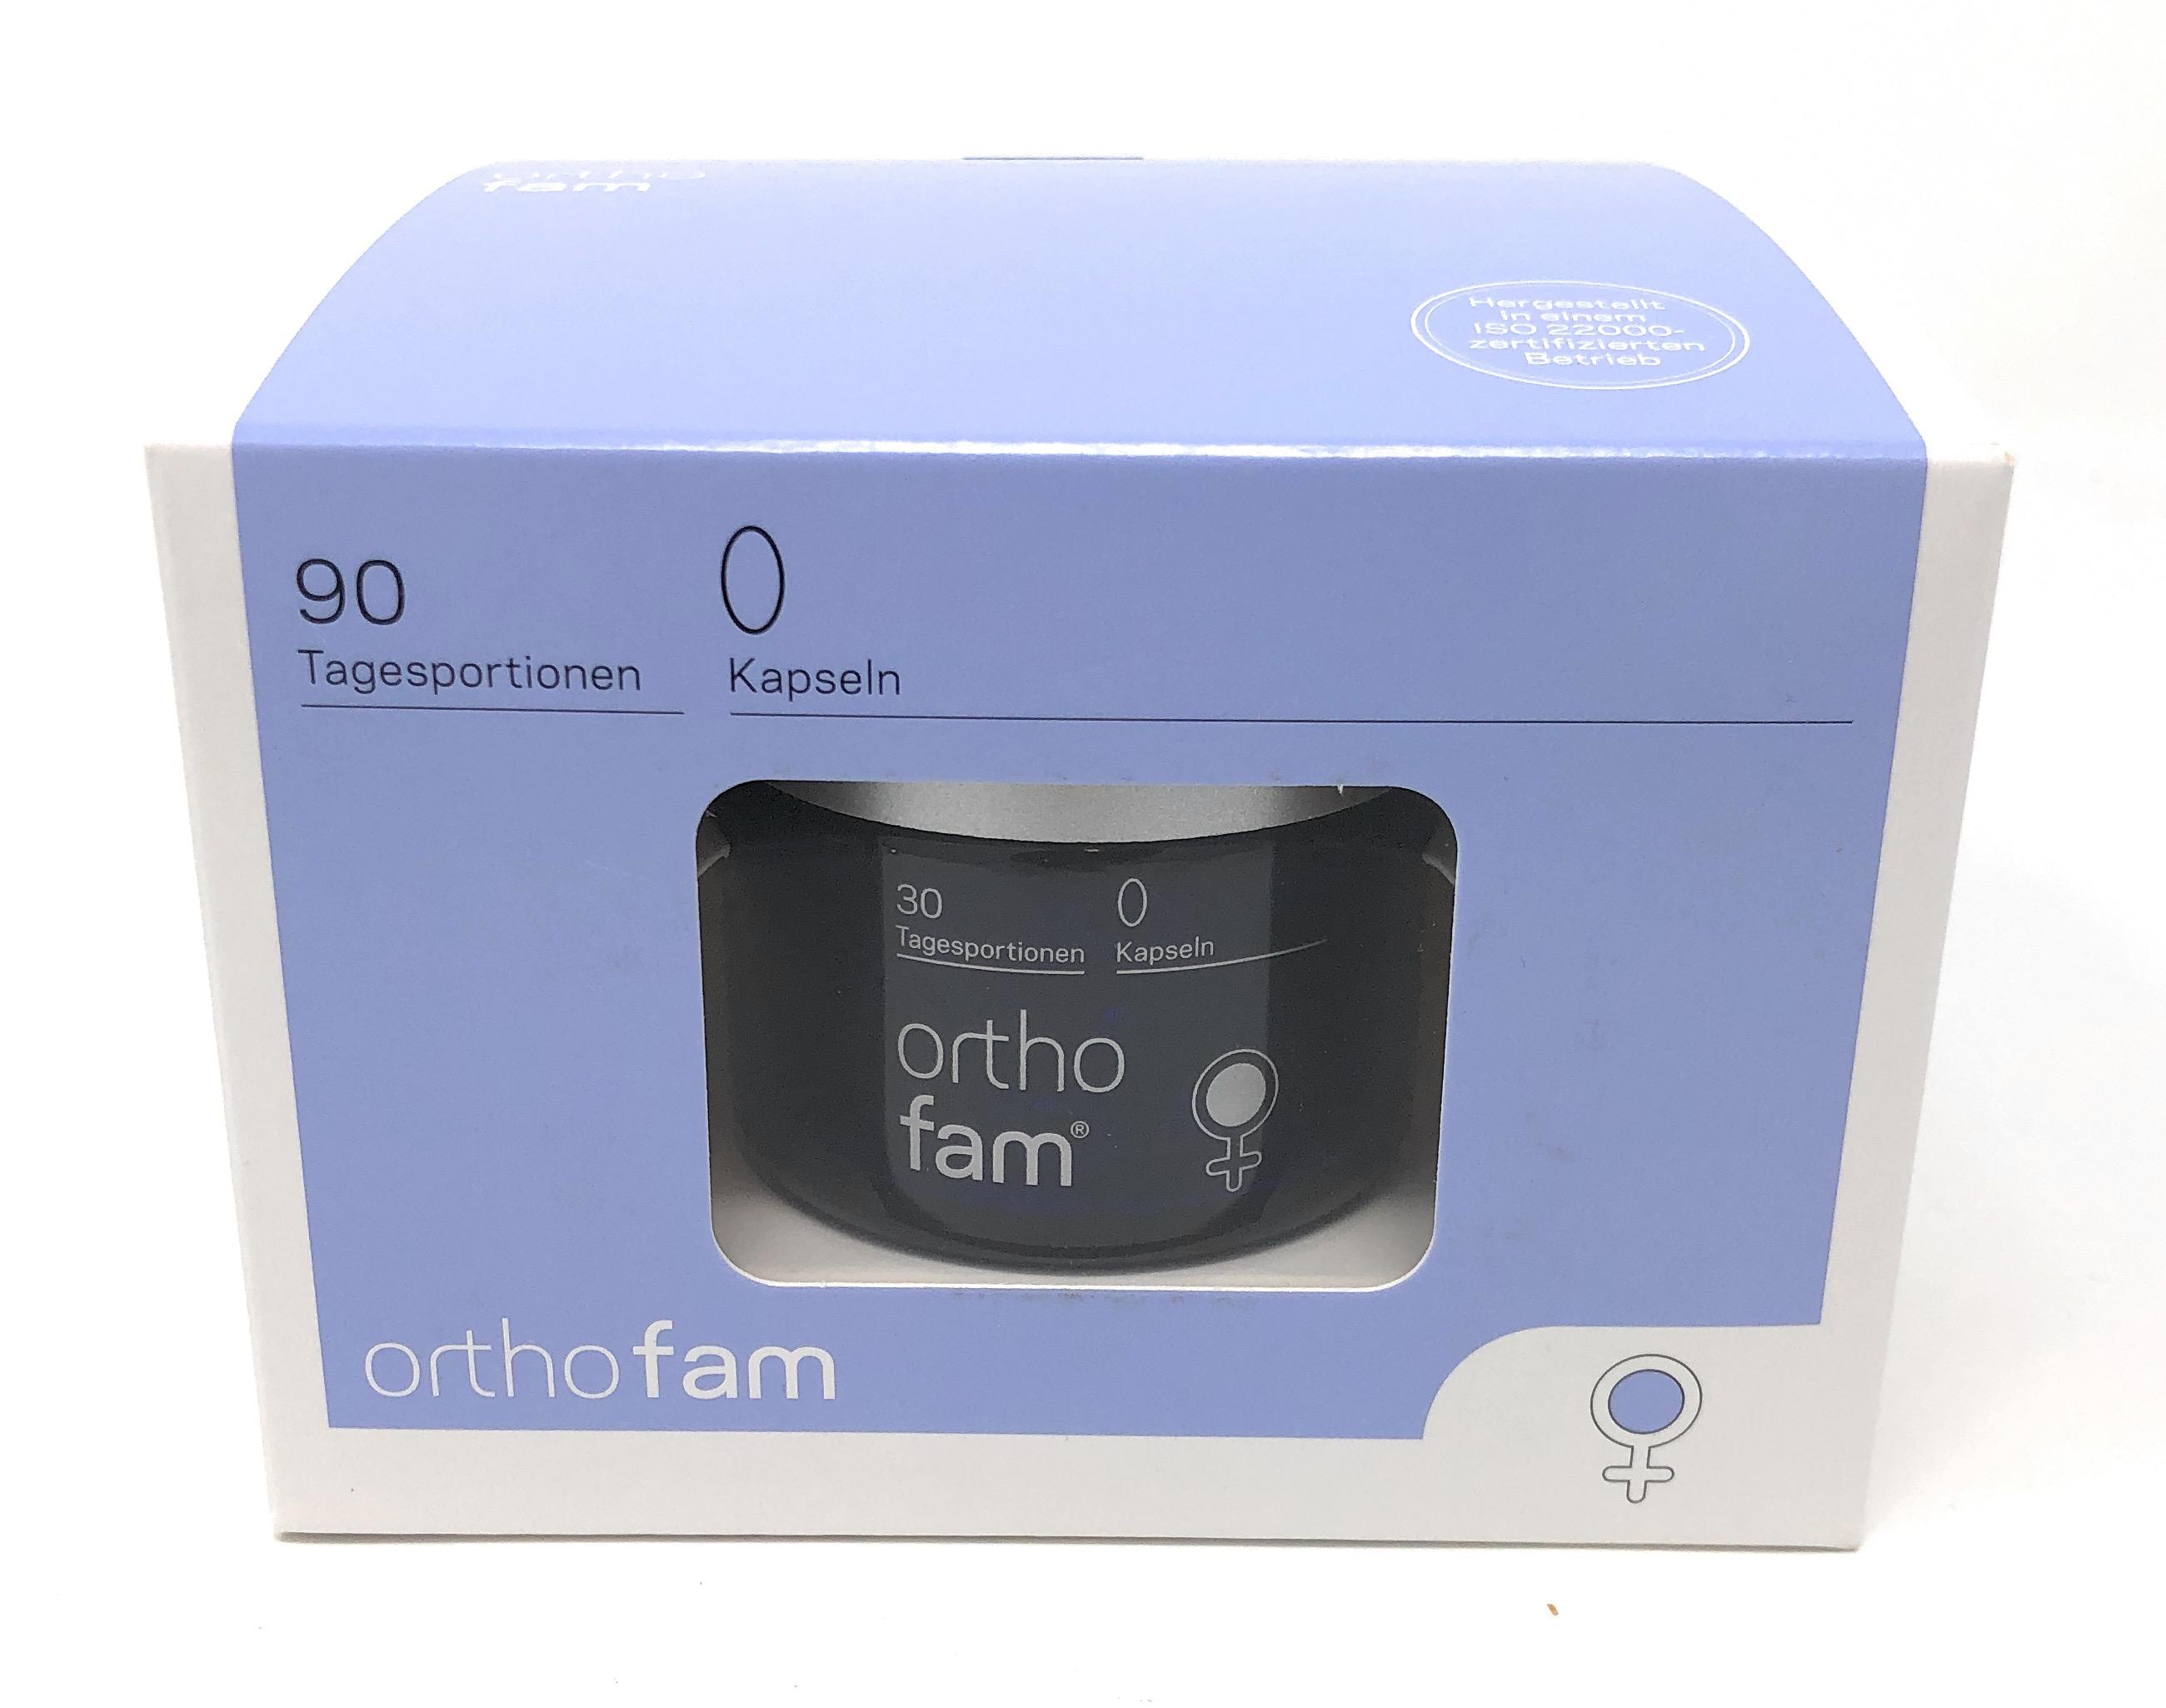 orthomed orthofam® 90 Tagesportionen (180 SG x 0,675g = 121,5g)